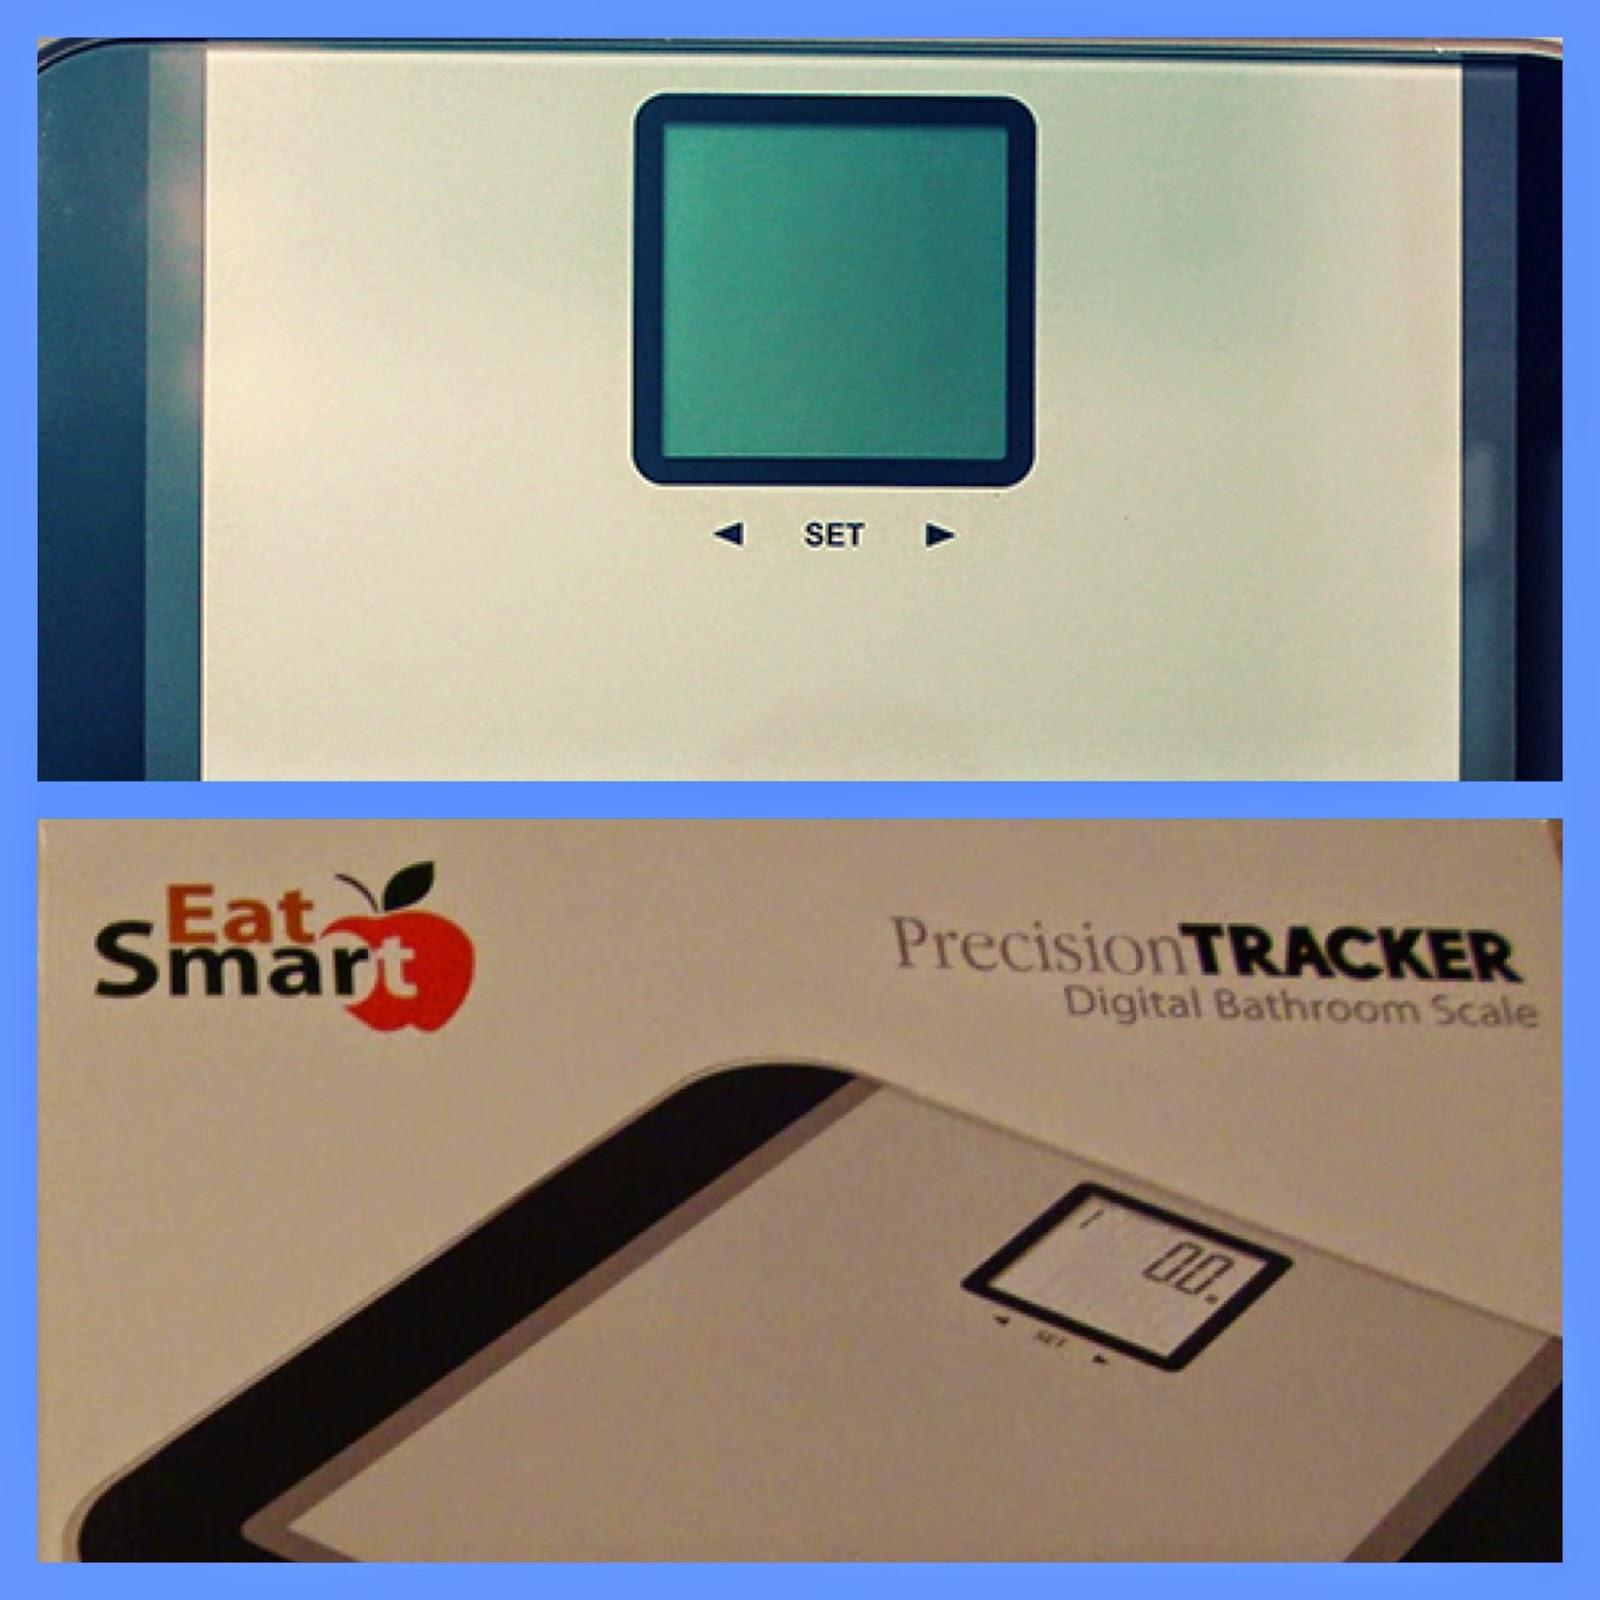 Review Bathroom Scales: Beauty Tech Reviews: EatSmart Precision Tracker Digital